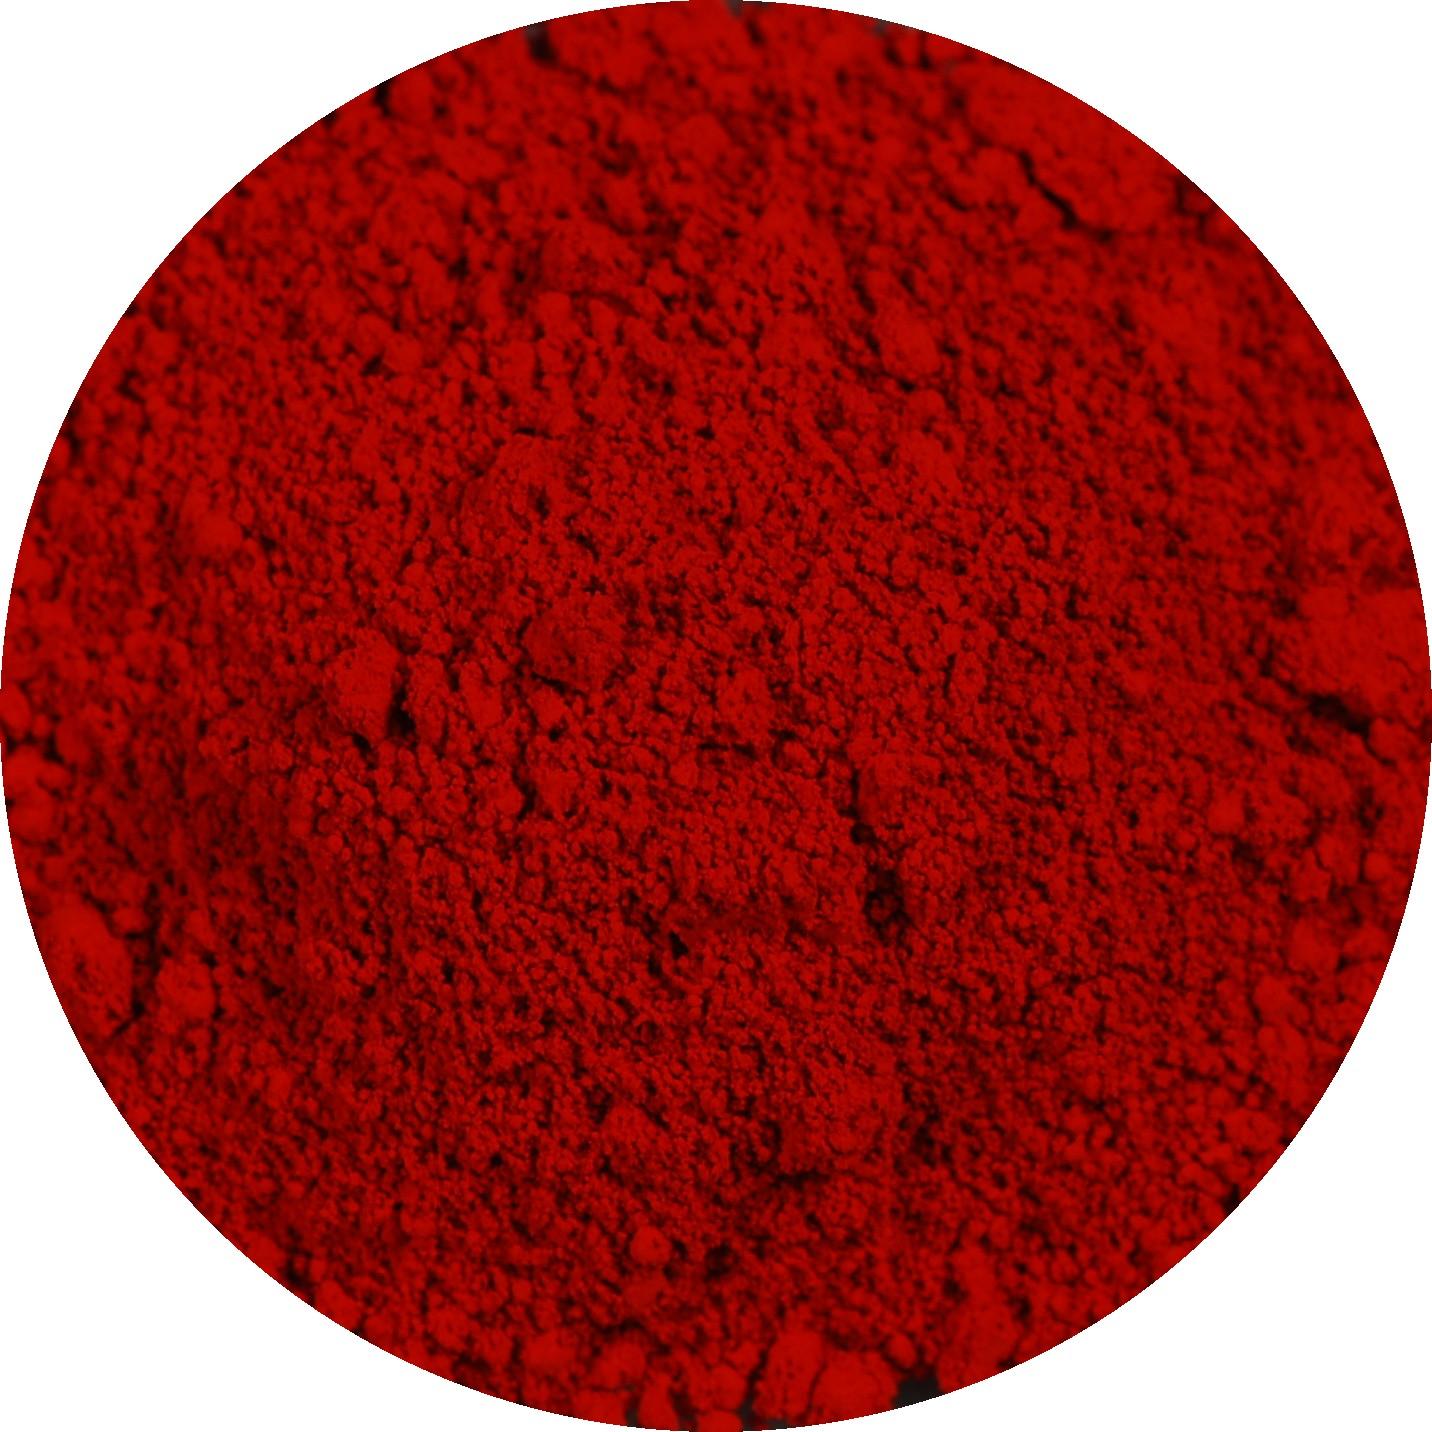 PR149_Rouge_p%C3%A9rylene.JPG